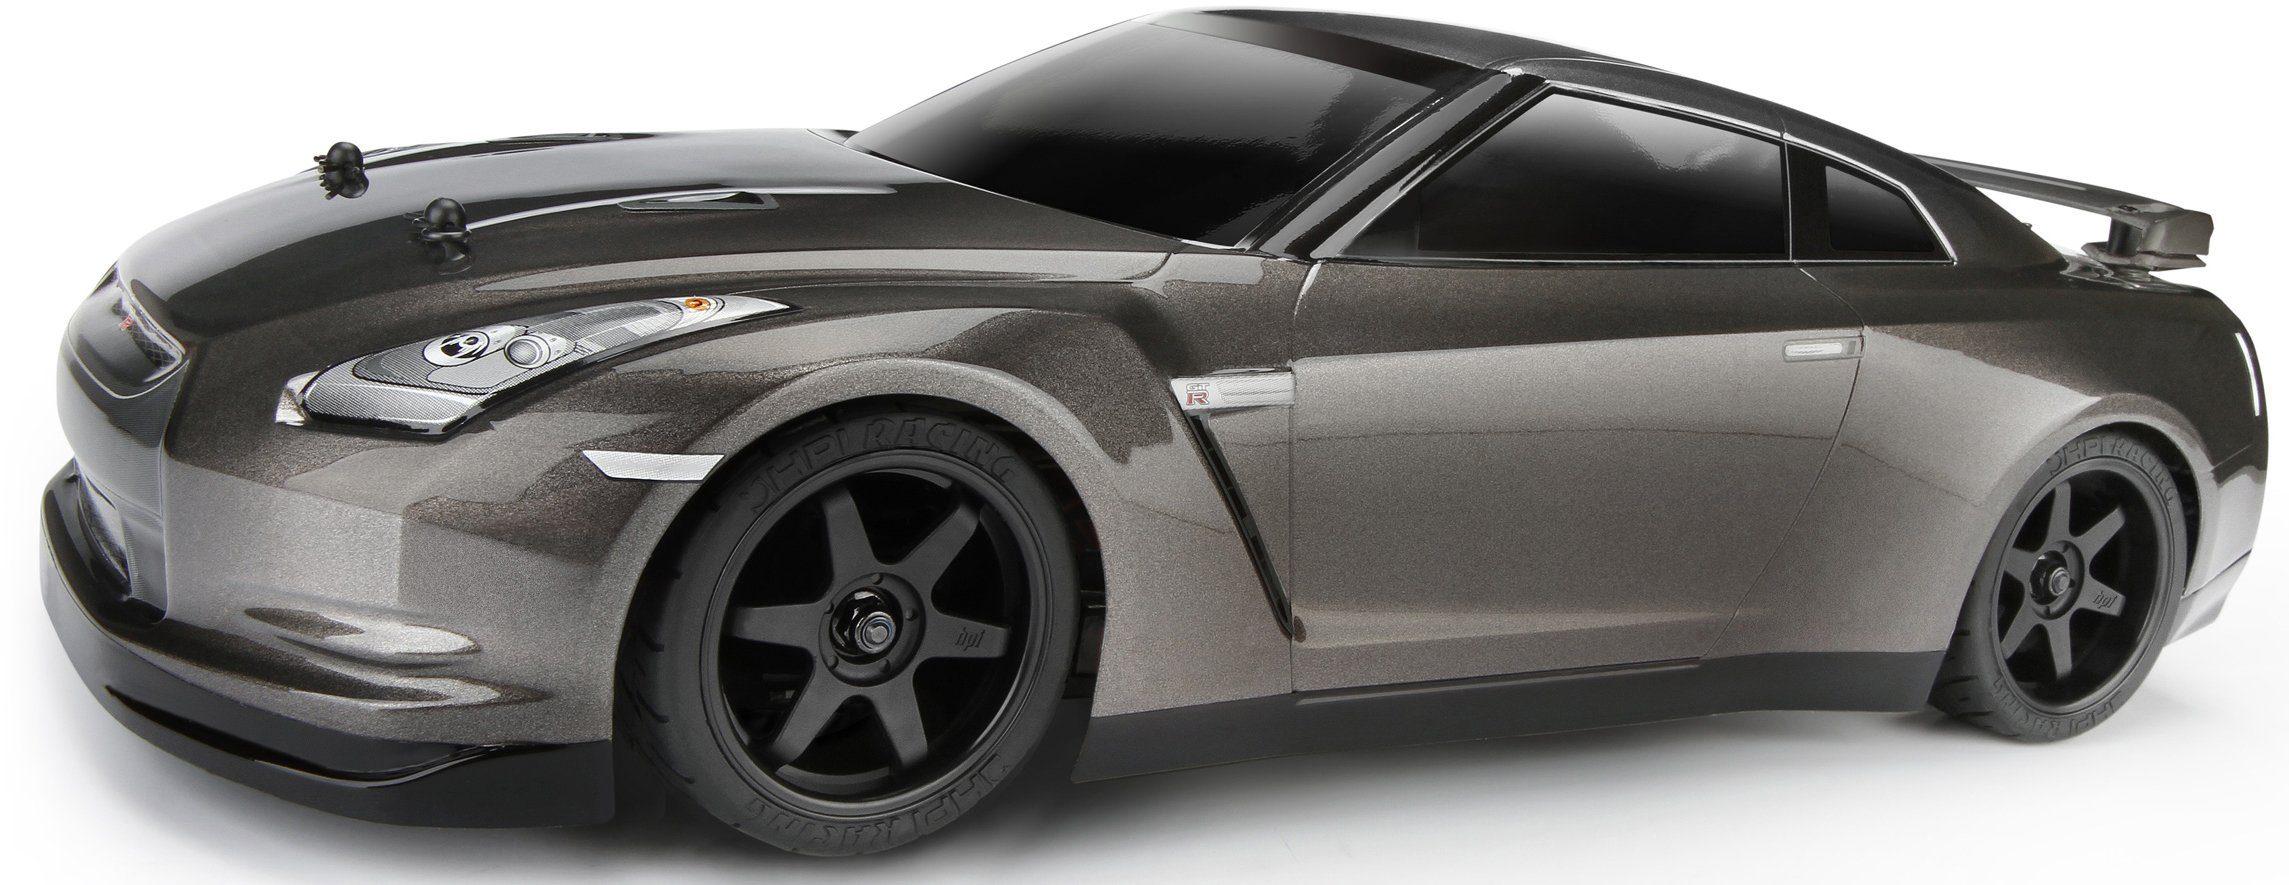 HPI Racing RC Komplettset, »Sprint 2 Sport, Nissan GTR R35 1:10 2,4 GHz«